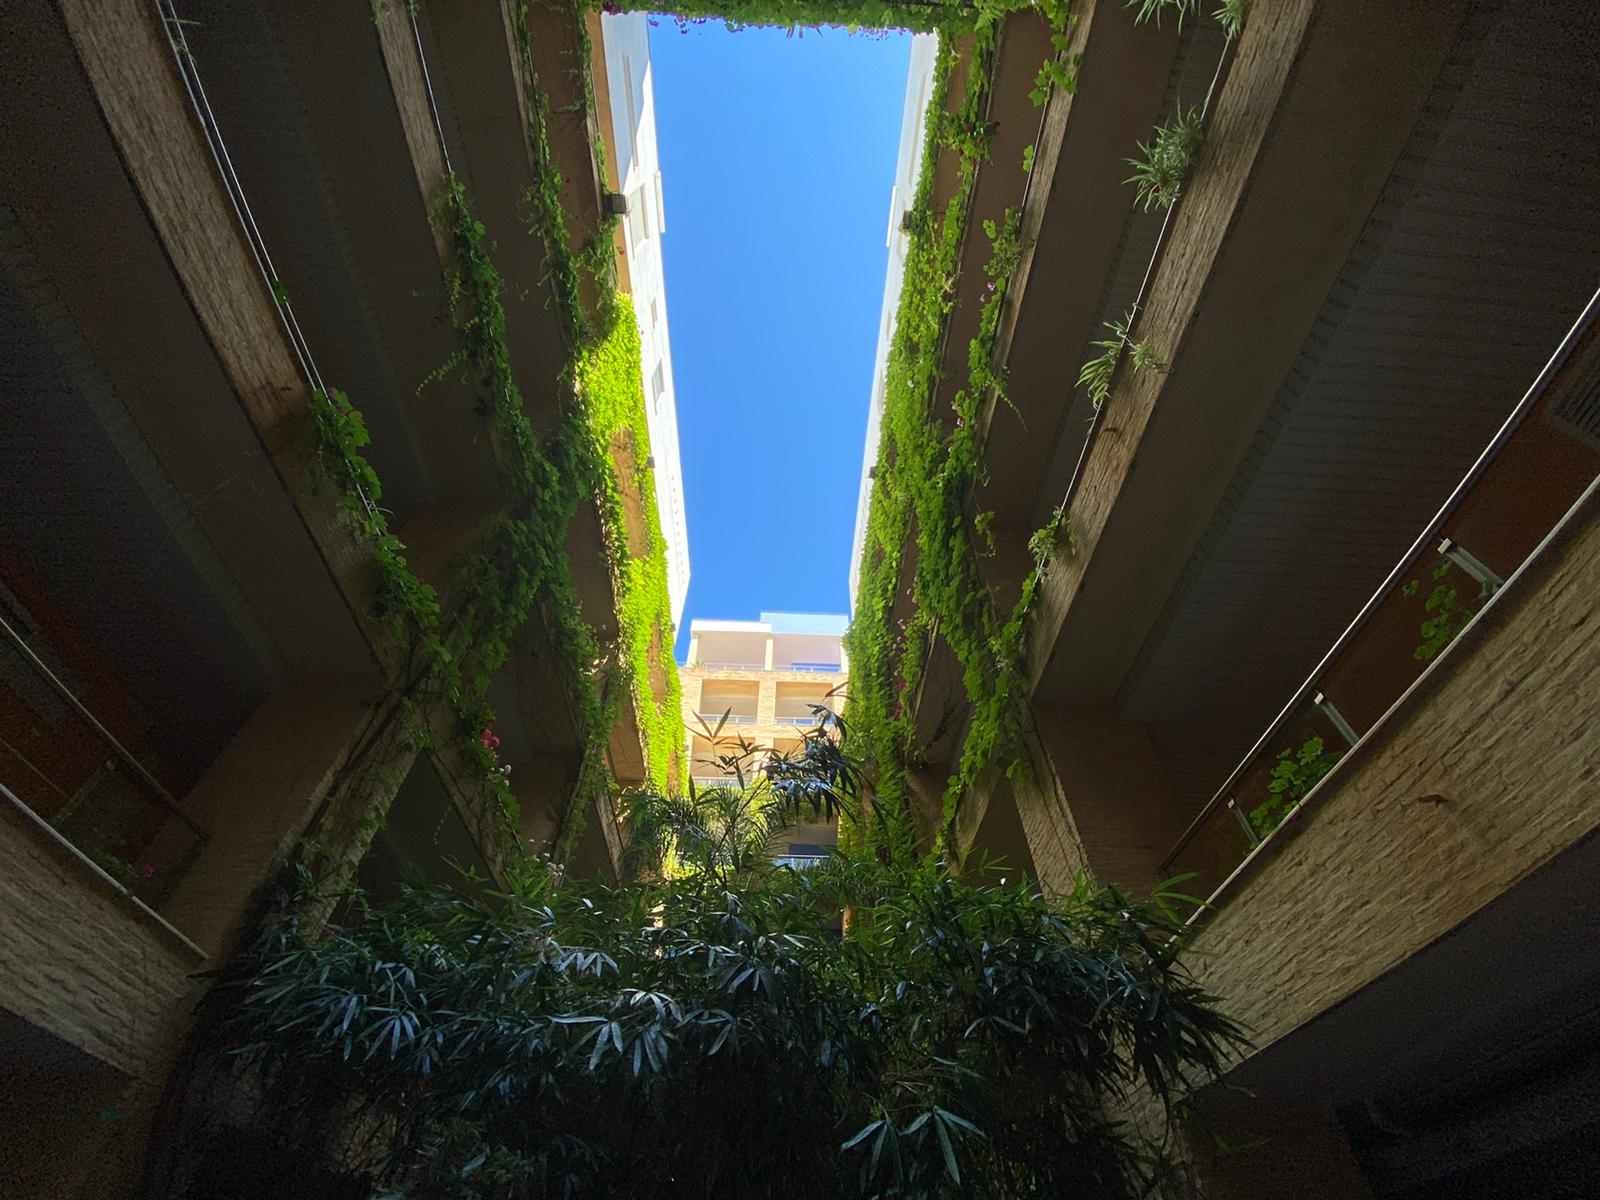 Imagen 31 del Apartamento en El Espigón, 1ª Planta nº4 Poniente (3d+2b), Punta del Moral (HUELVA), Paseo de la Cruz nº22